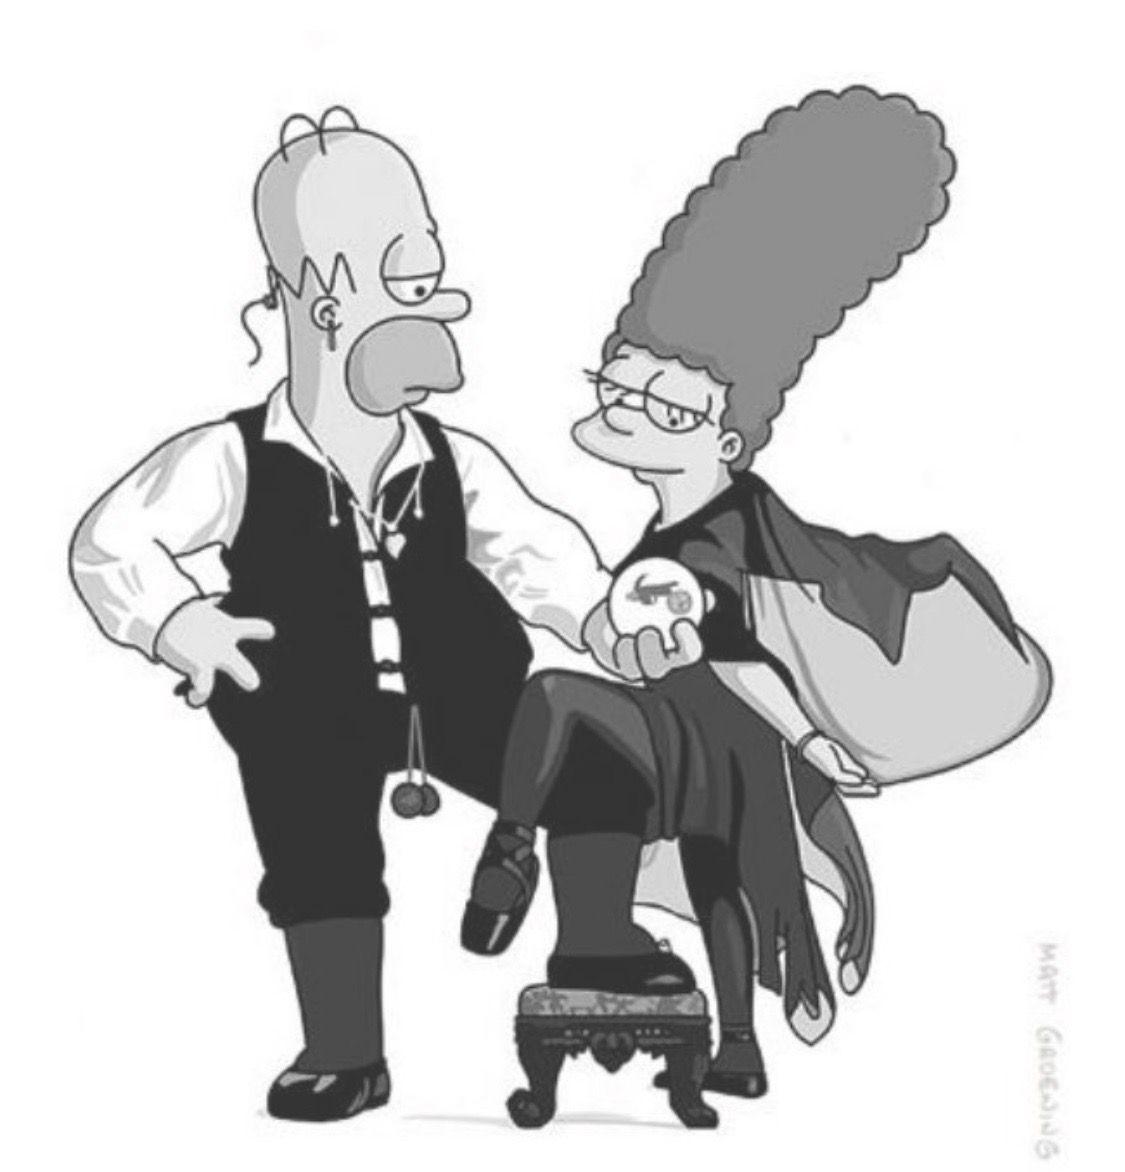 The Simpsons Doing The Fleetwood Mac Album Cover Fleetwood Mac Fleetwood Mac Rumors Peter Green Fleetwood Mac